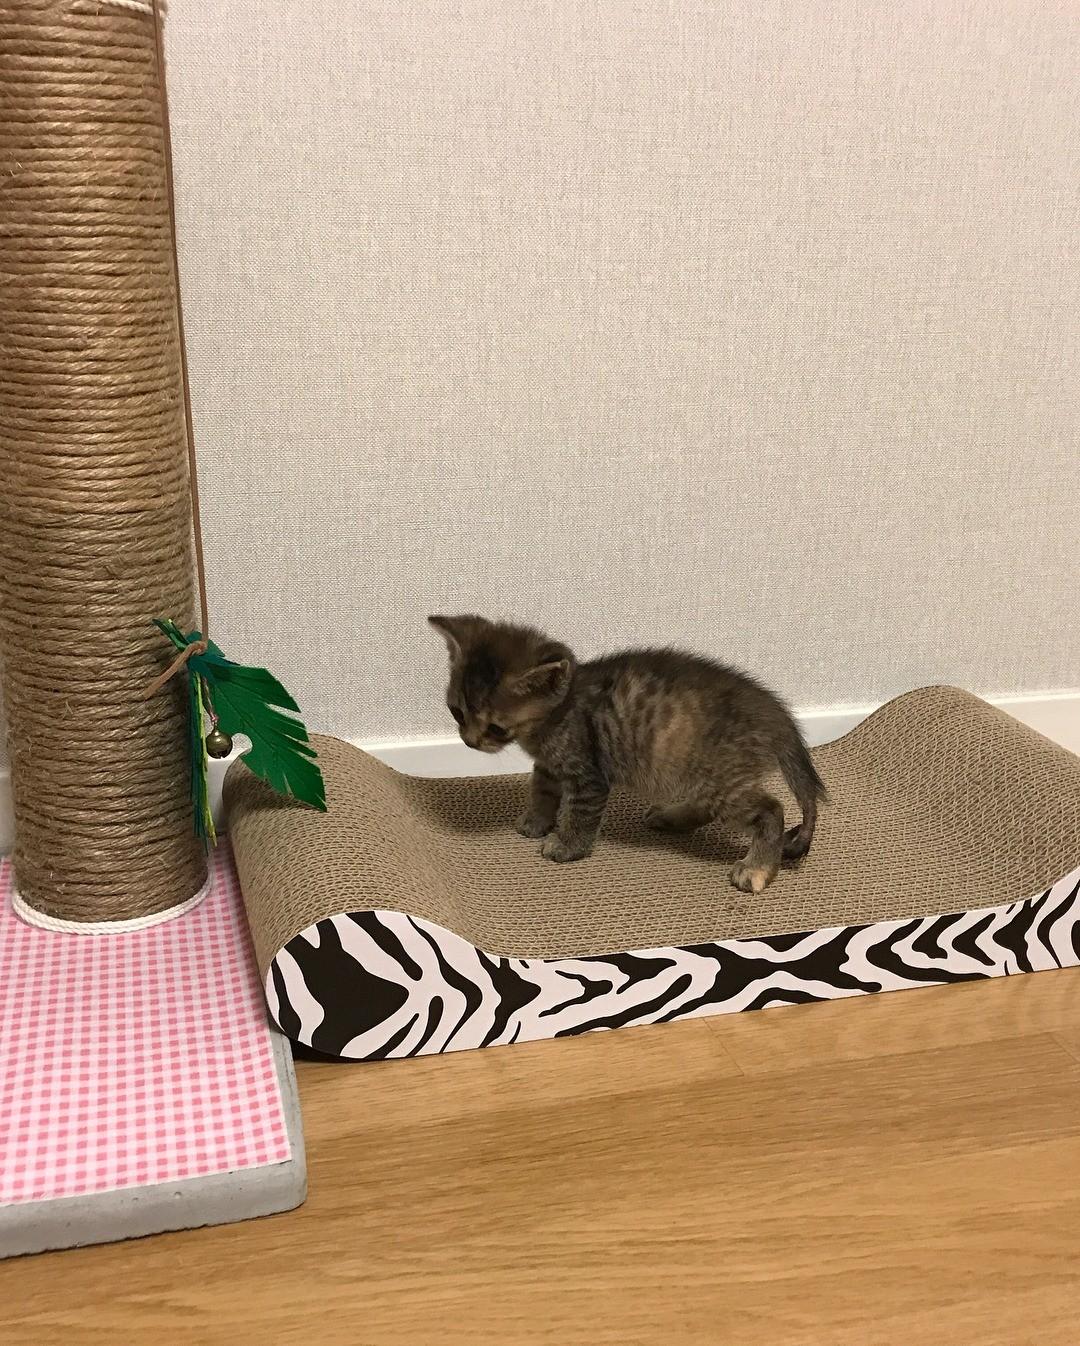 Instagram kittensaysmilk